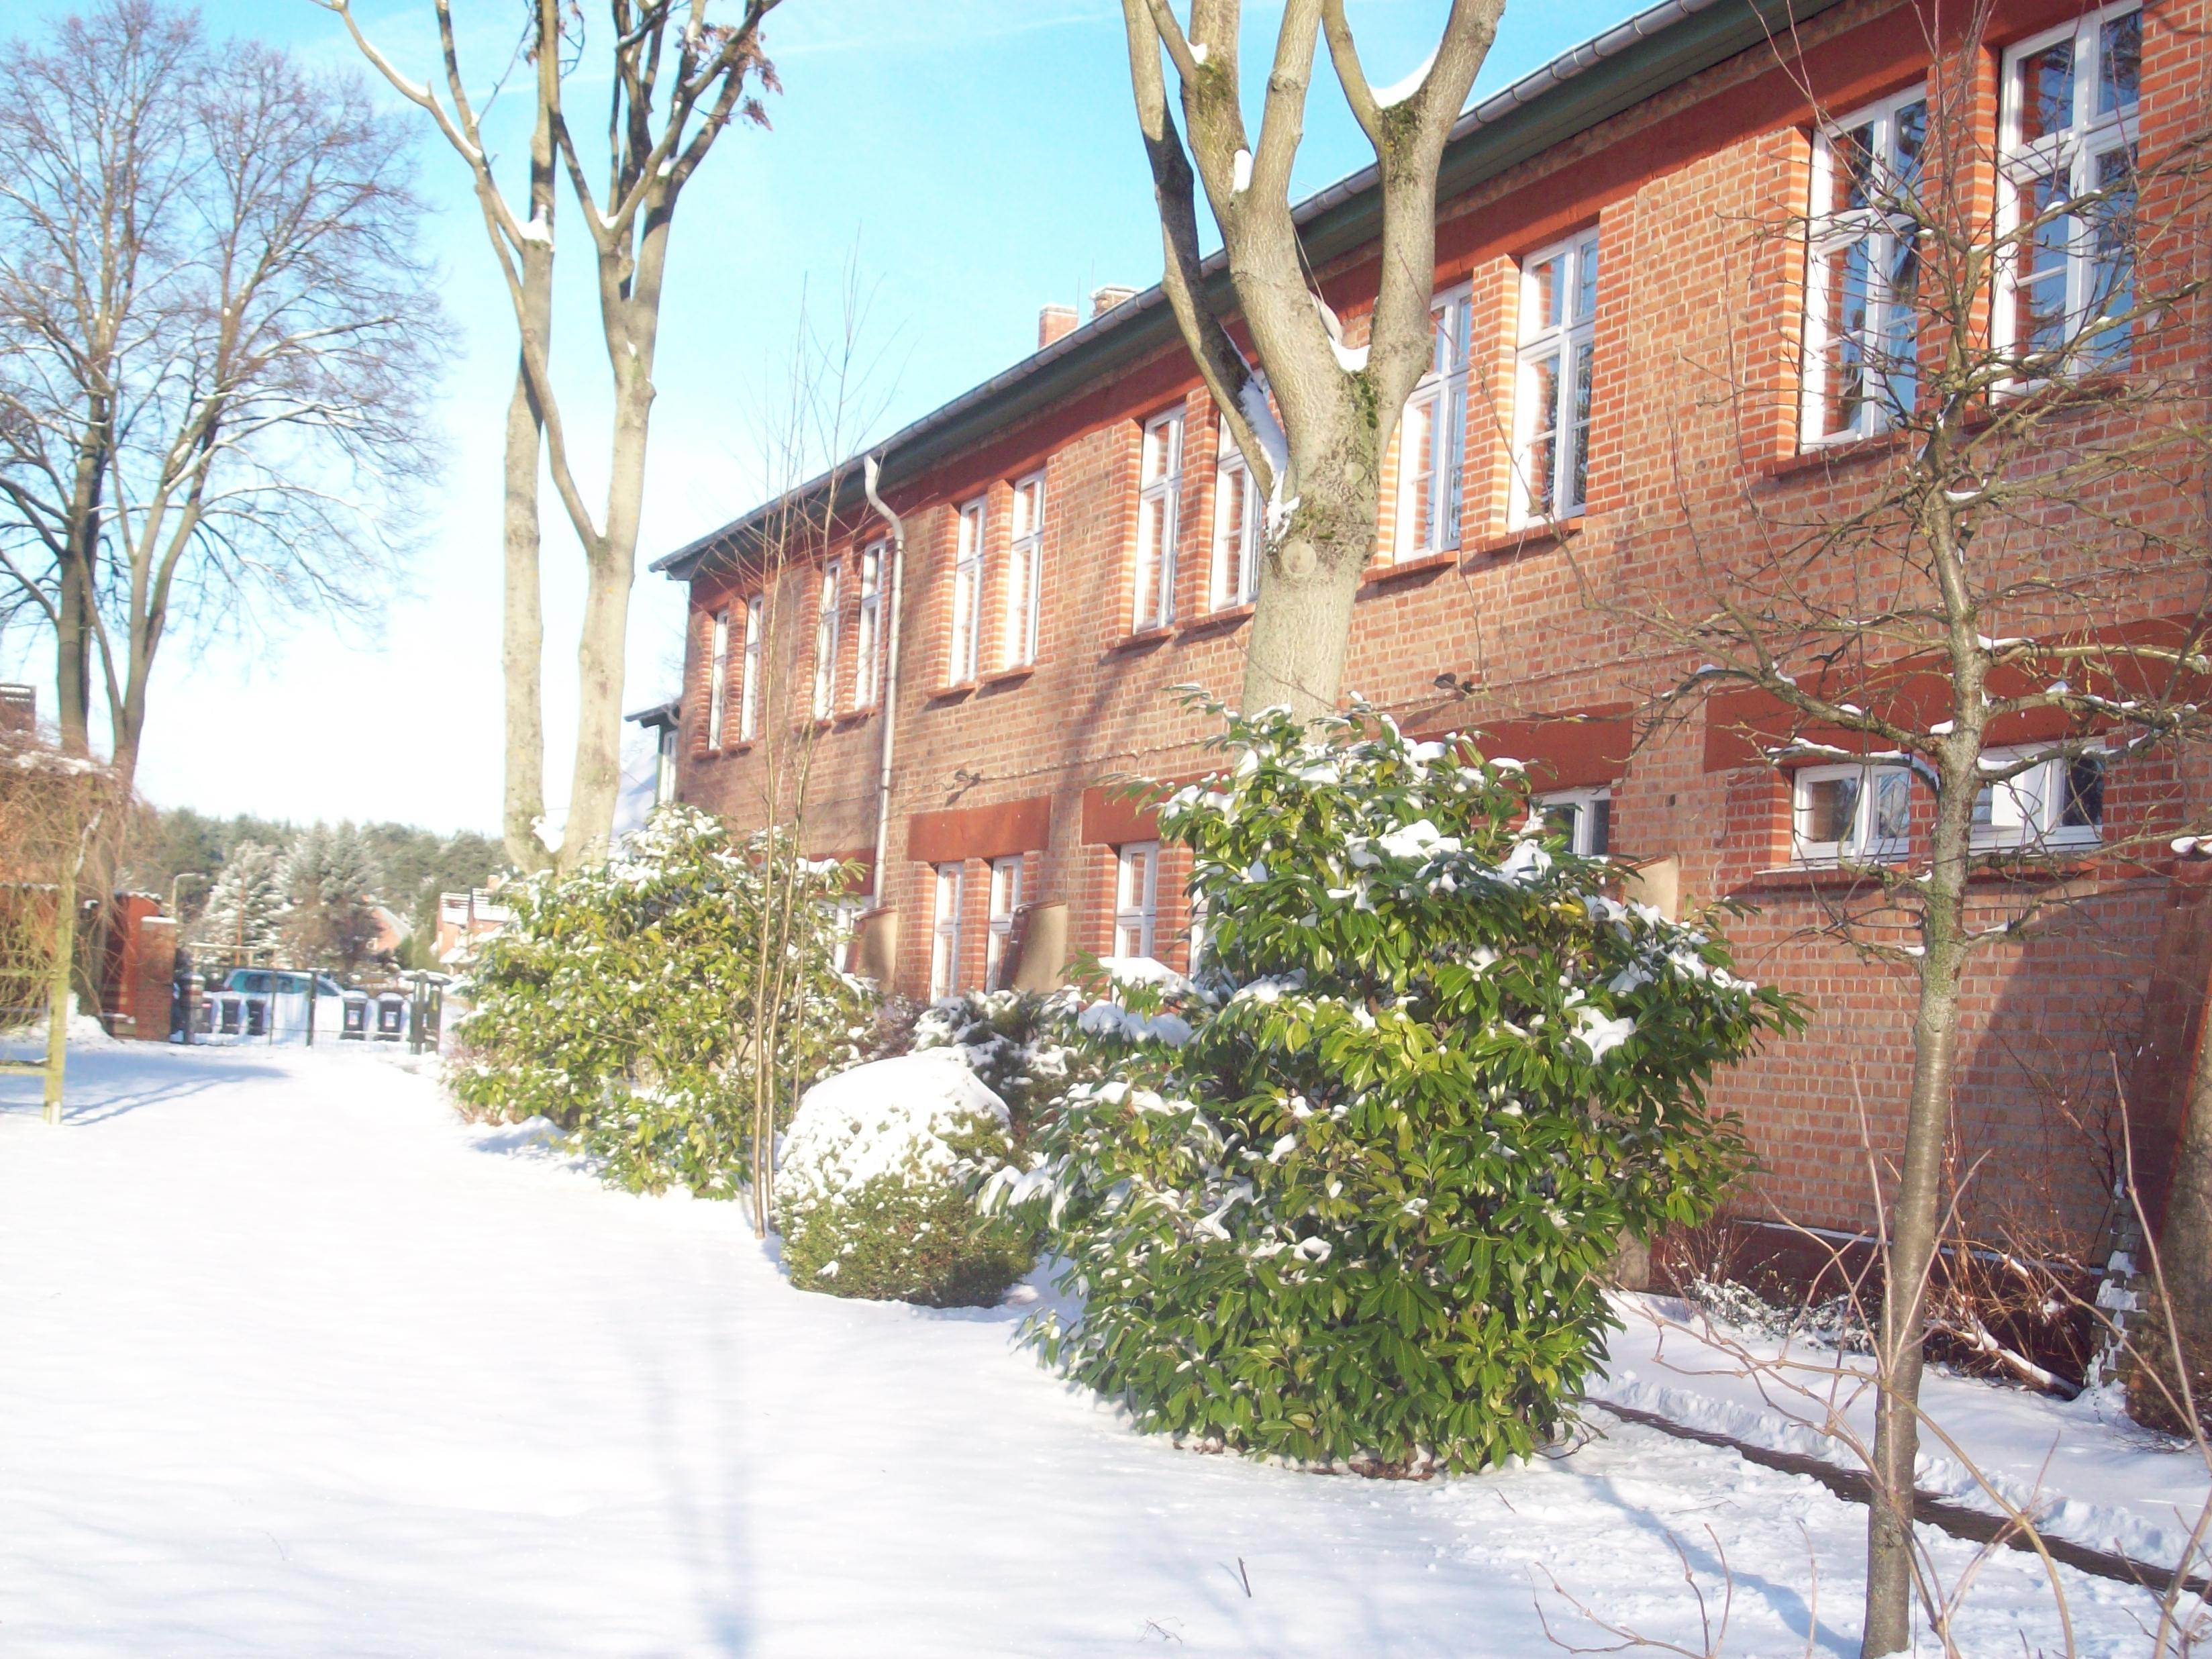 Winterspaß in der Jugendherberge Malchow